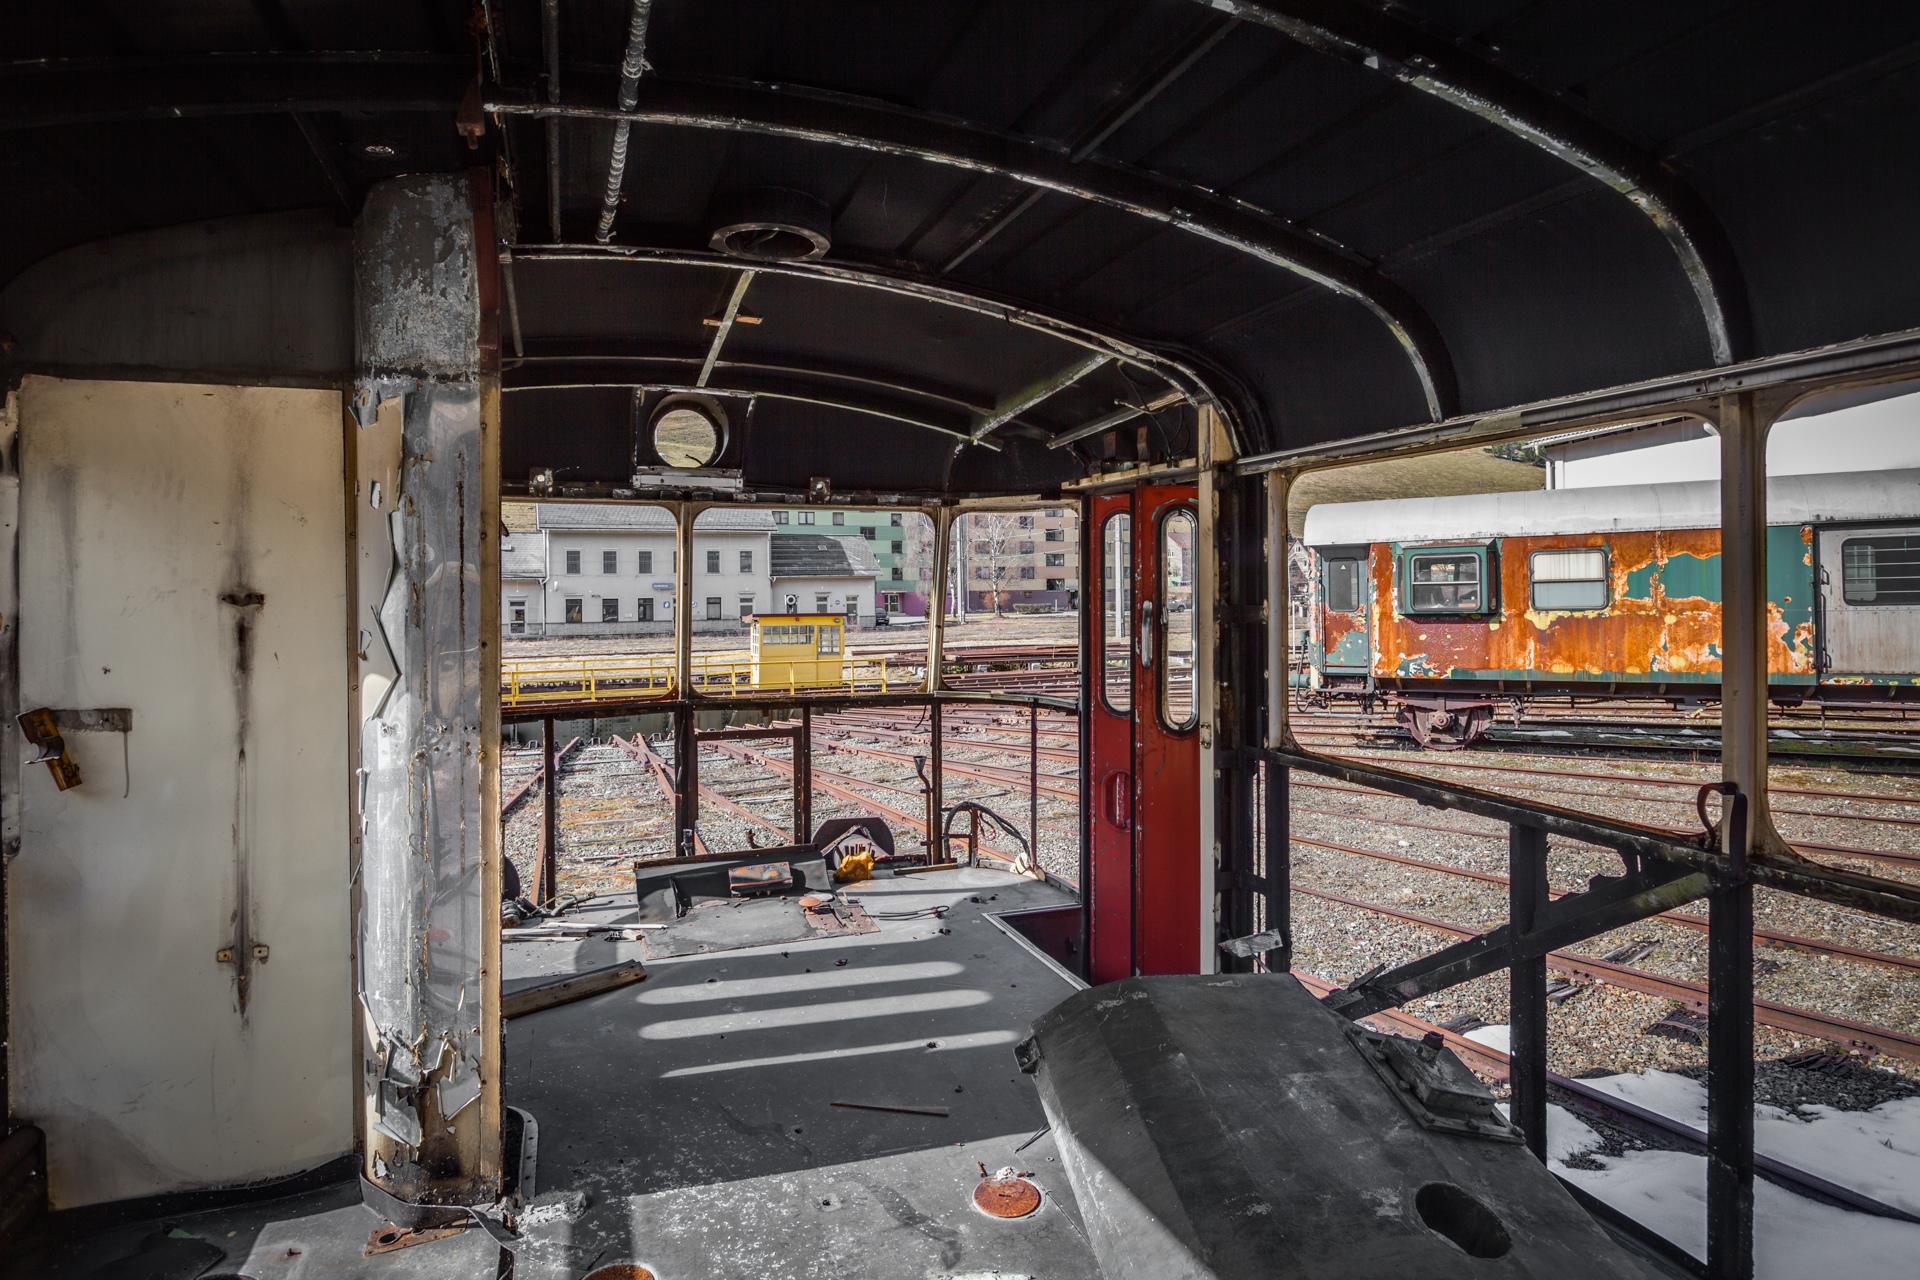 Urban Exploration - Turntable Station - Skeleton Train